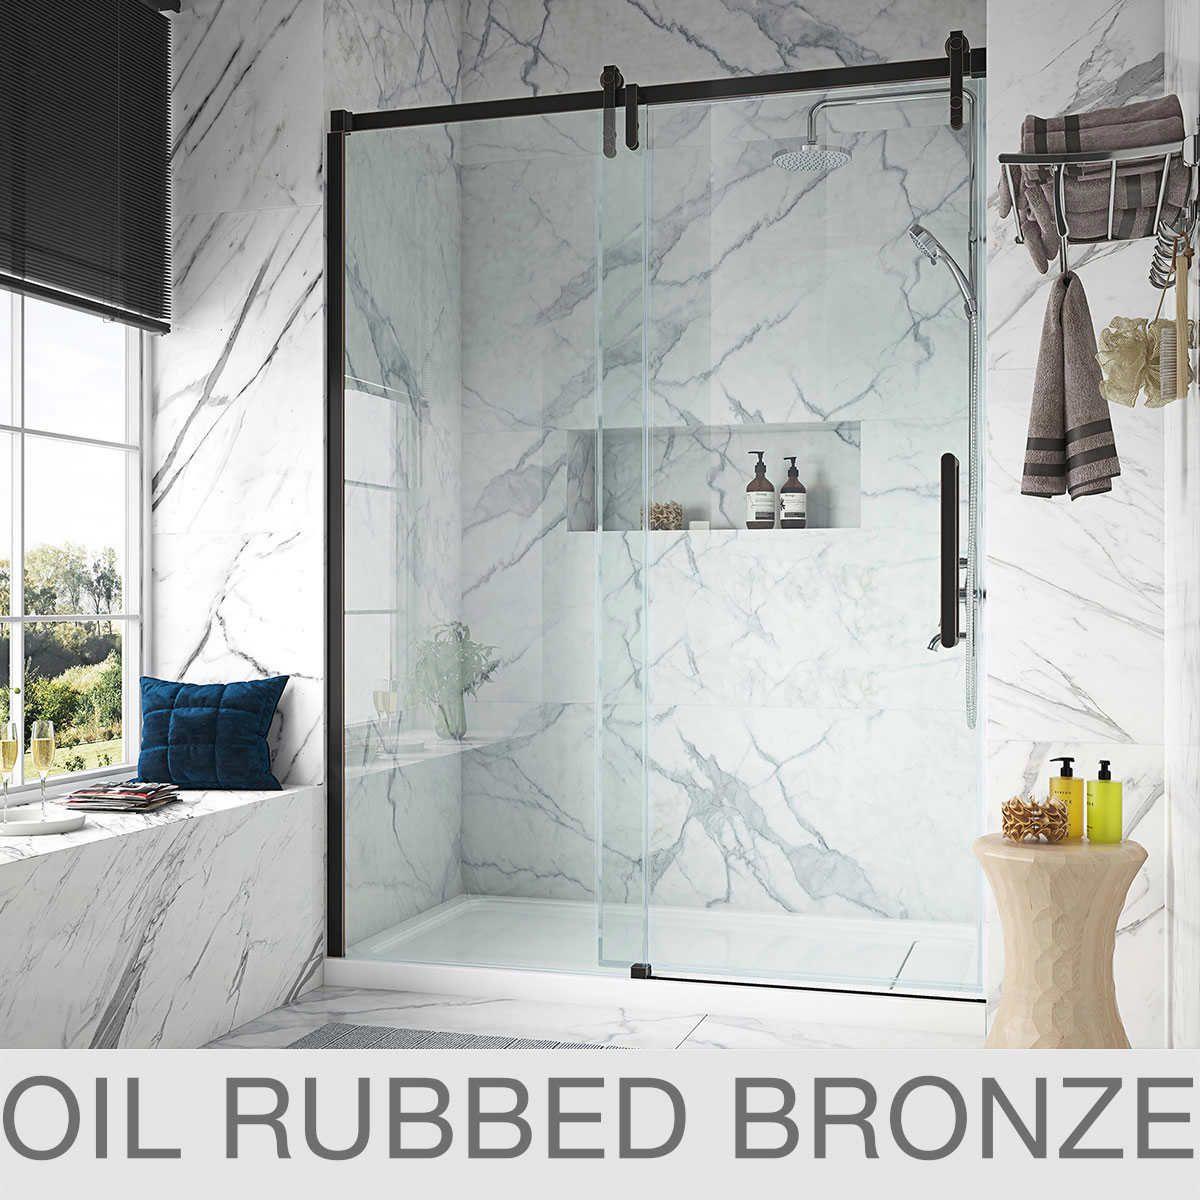 Ove Decors Sheffield 60 Tempered Glass Shower Door In 2020 Glass Shower Doors Tempered Glass Shower Doors Shower Doors